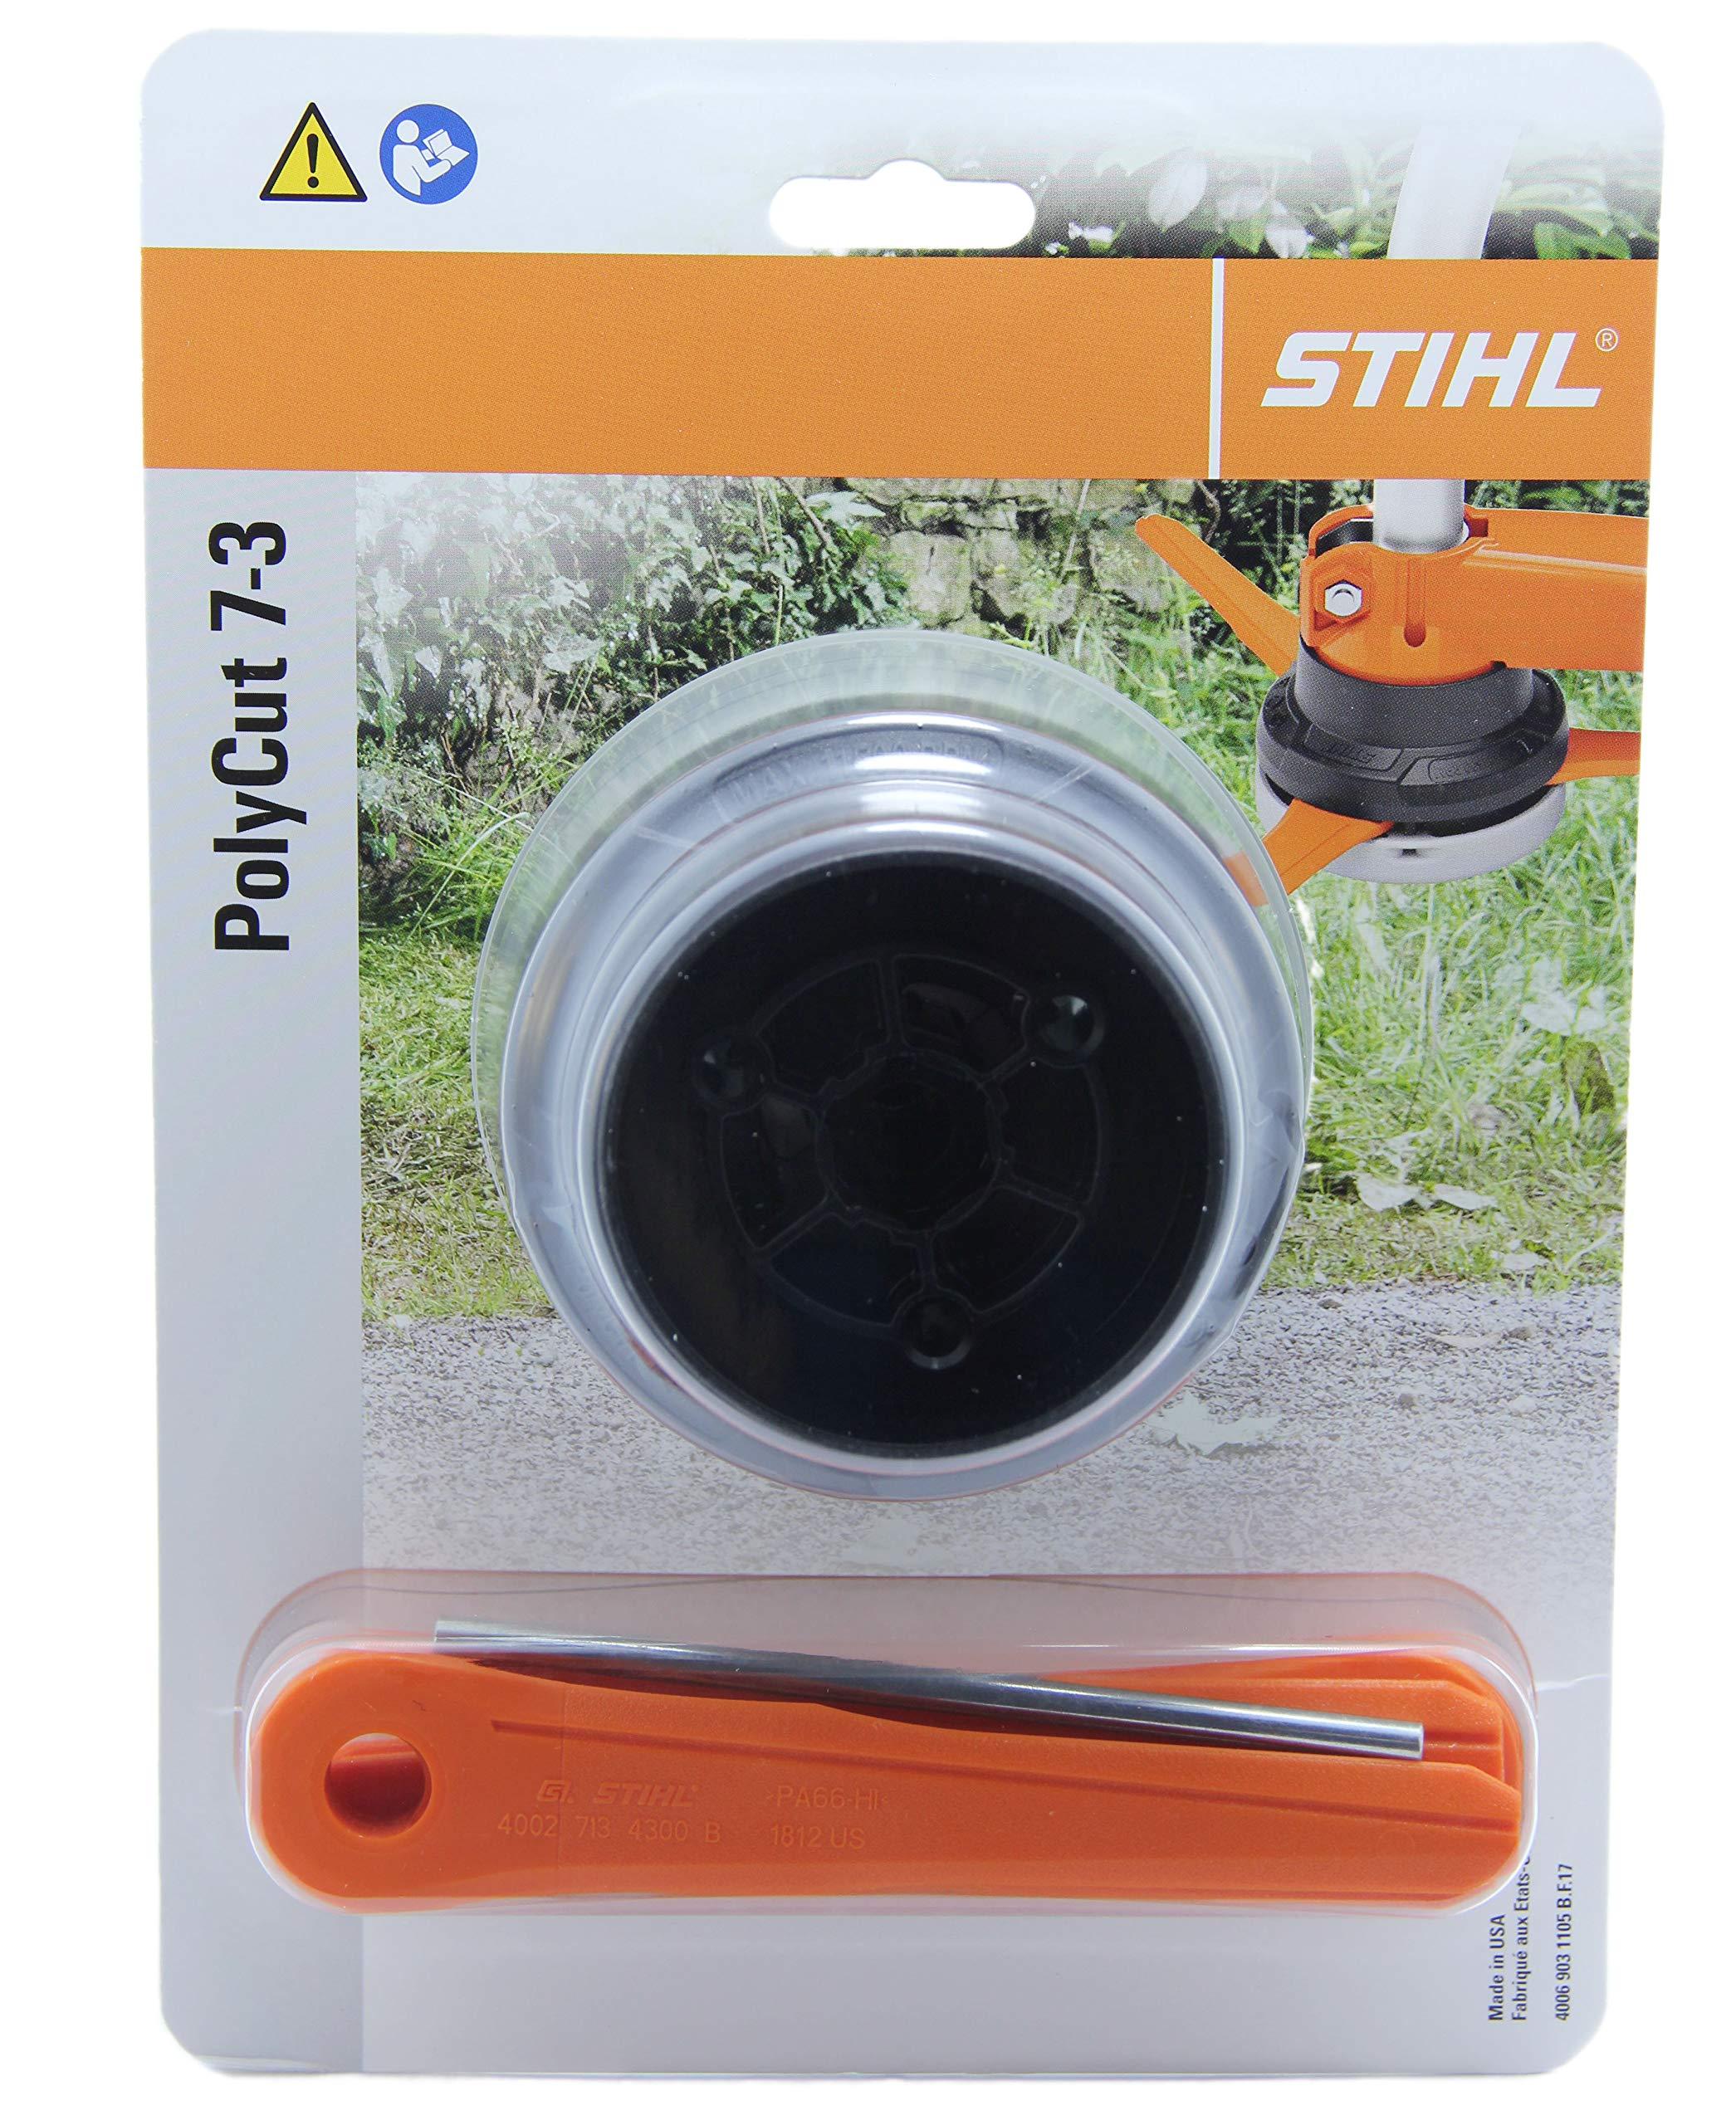 STIHL POLYCUT 7-3 Cutting Mowing BRUSHCUTTER Head (4006 710 2127) Fulfilled by Amazon! by Germany Stihl